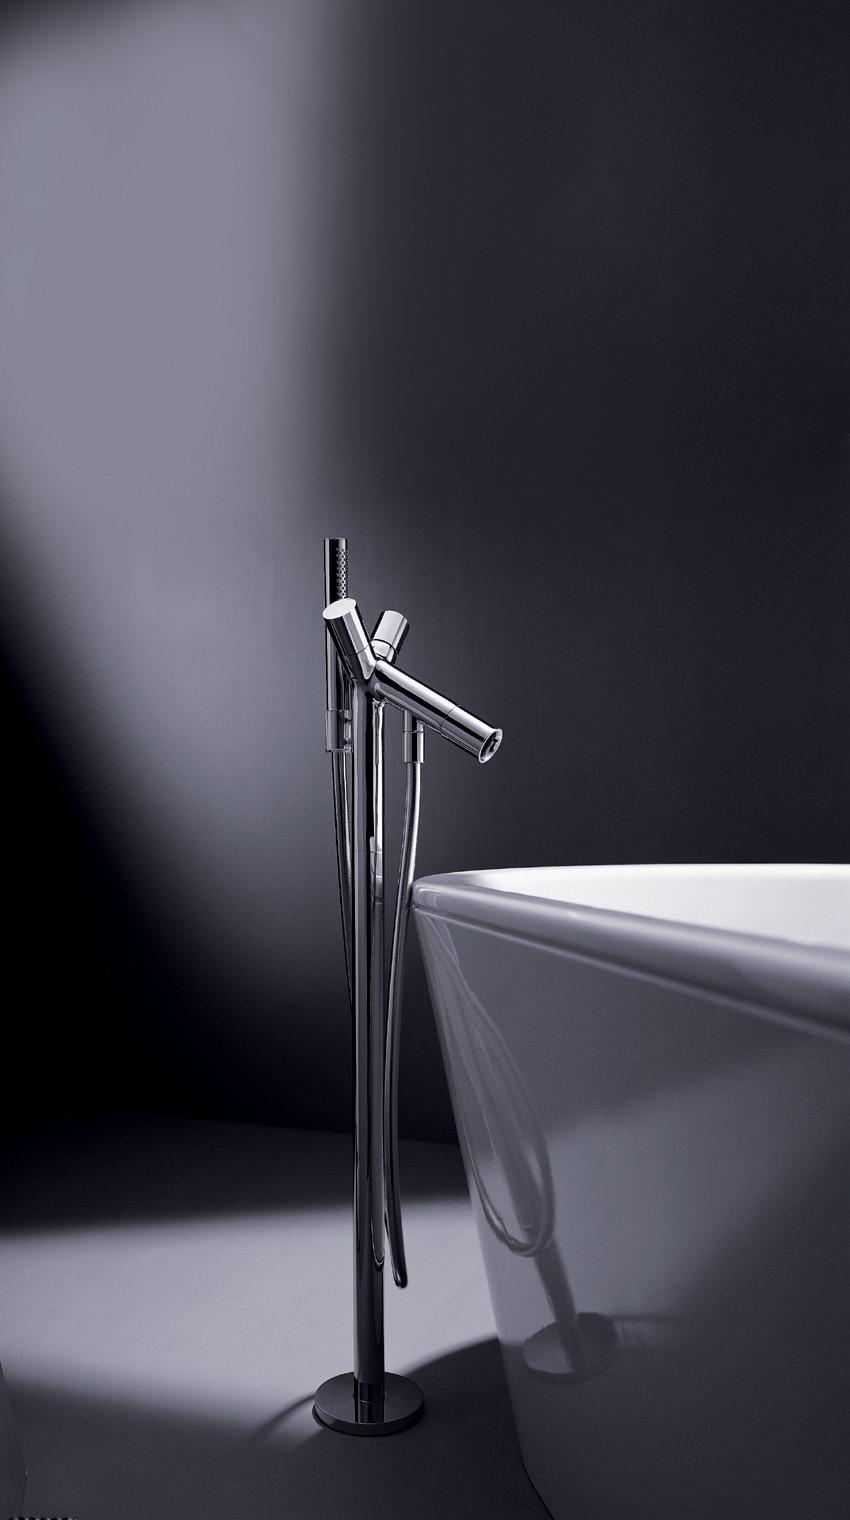 Bath4All - Hansgrohe 10458821 Brushed Nickel Axor Starck Tub Filler ...